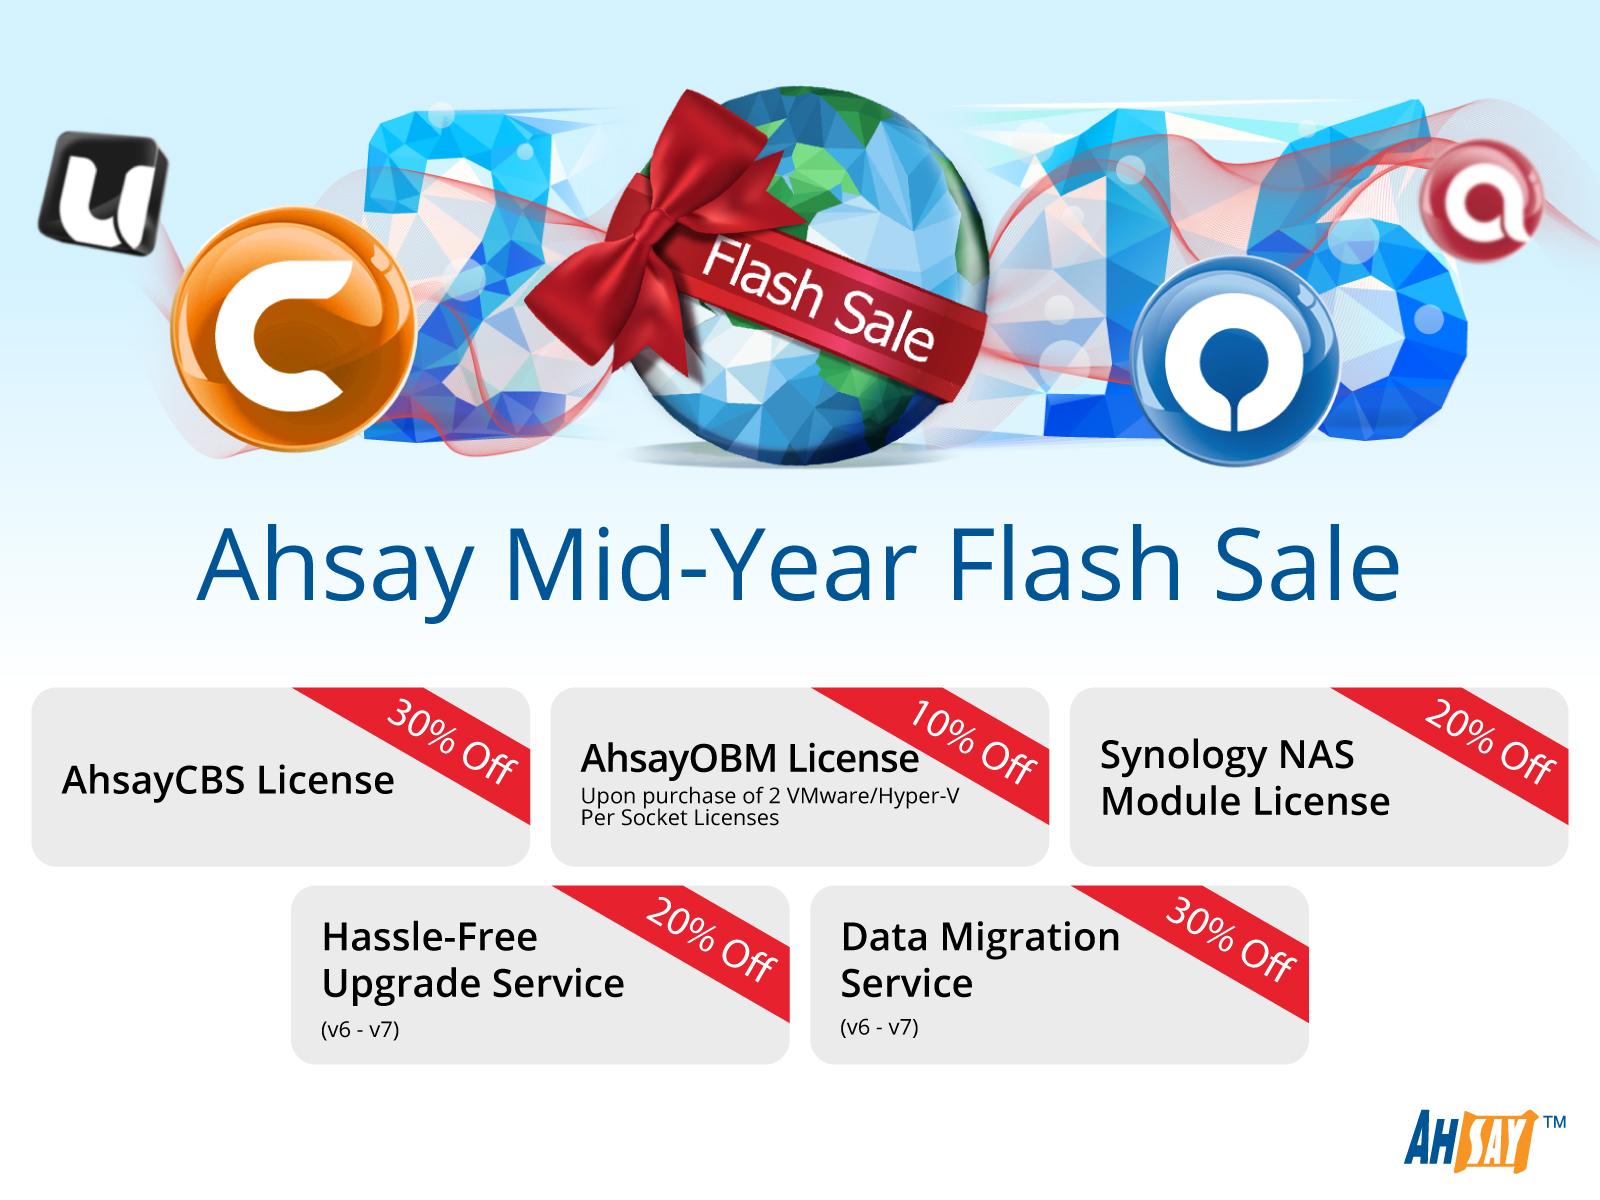 Ahsay Mid-Year Flash Sale 2016